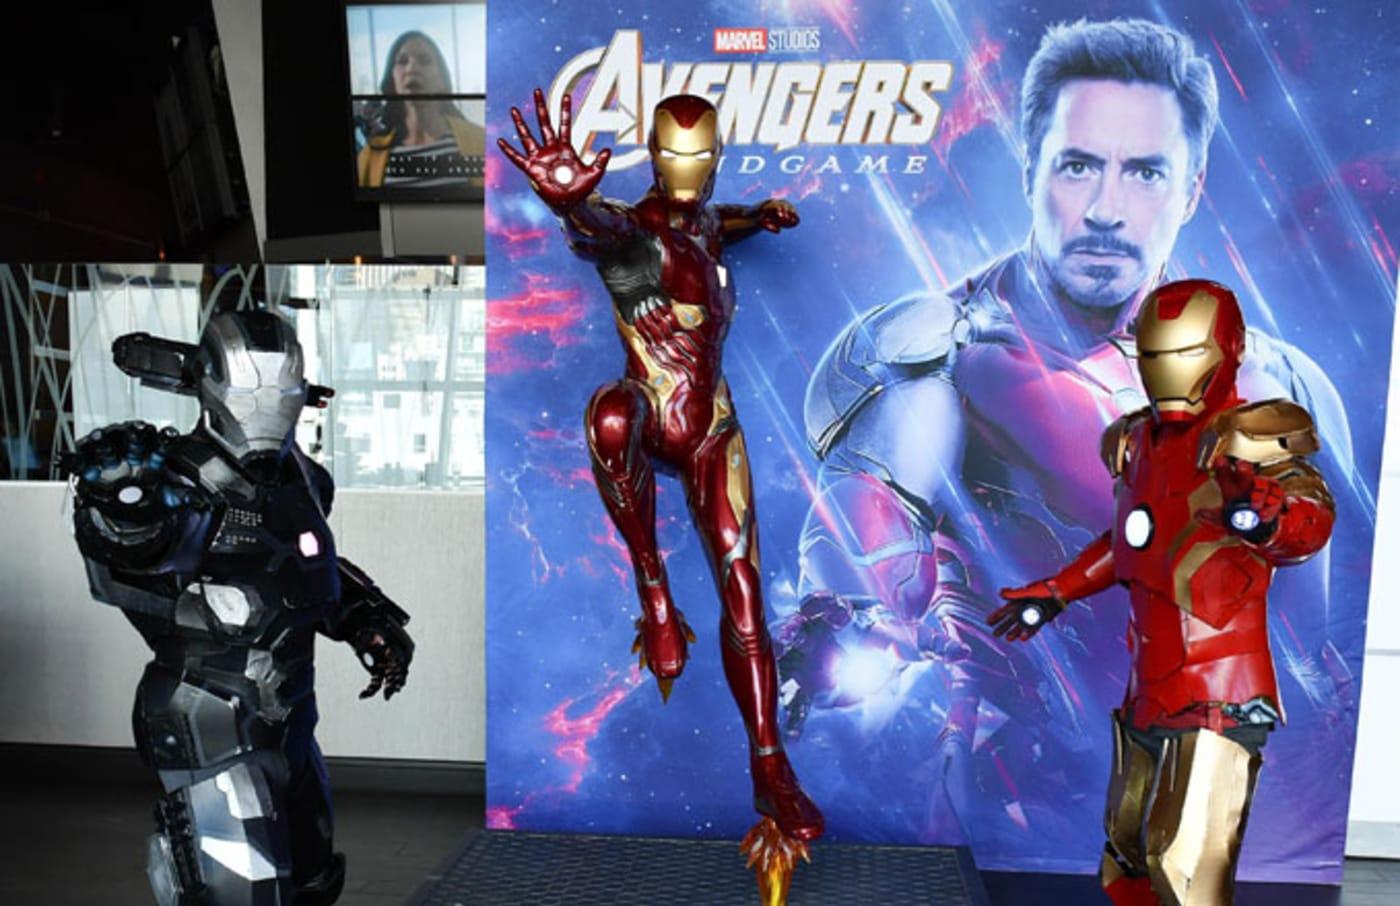 An Avengers Iron Man display.